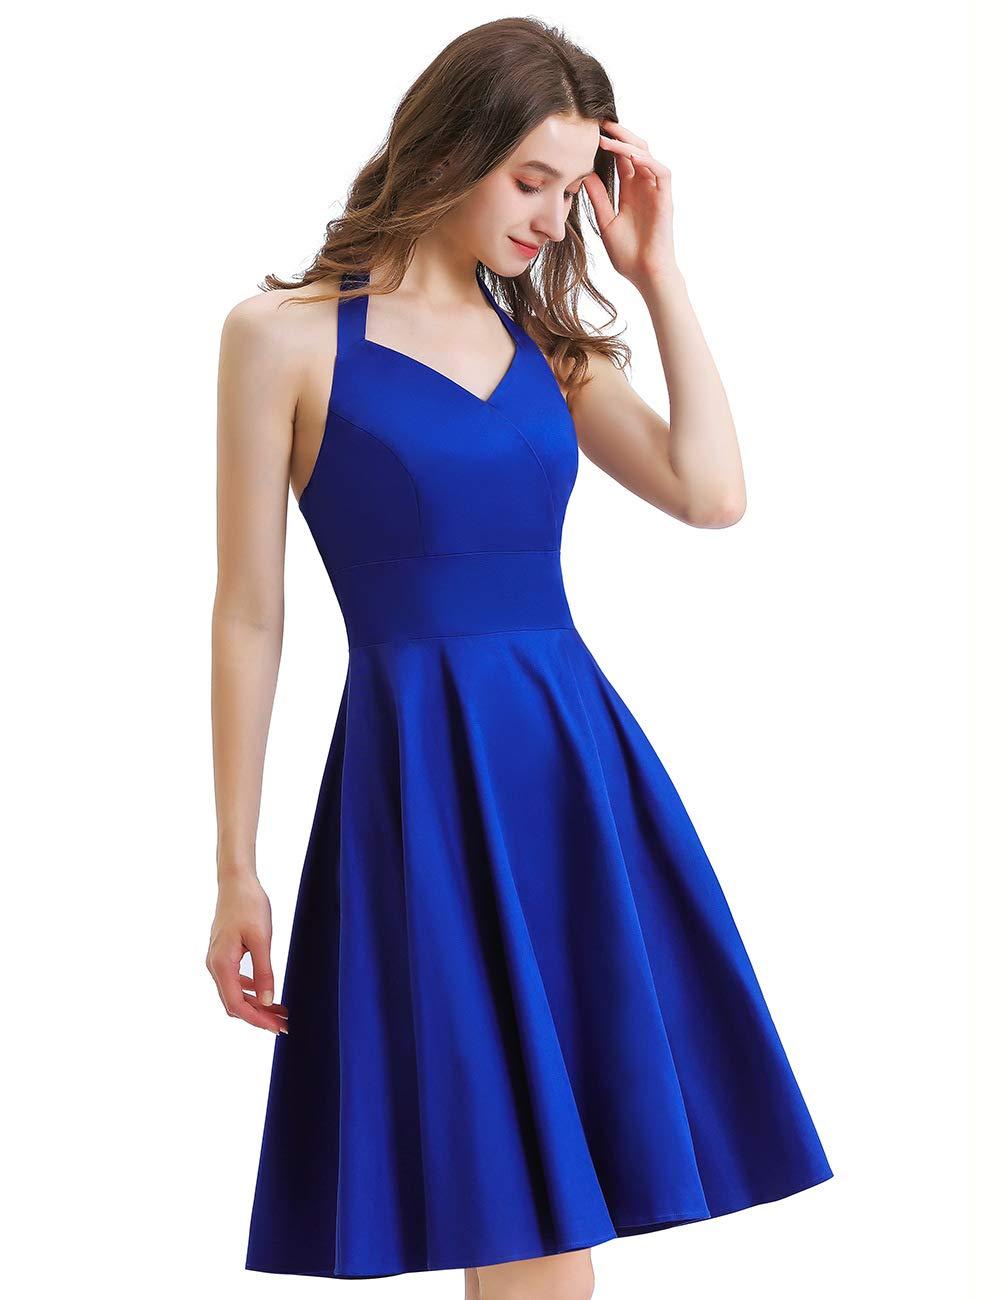 Vintage 1950s Hepburn Dress,Womens Homecoming Vintage Sleeveless Keyhole Flared A-Line Dress with Belt